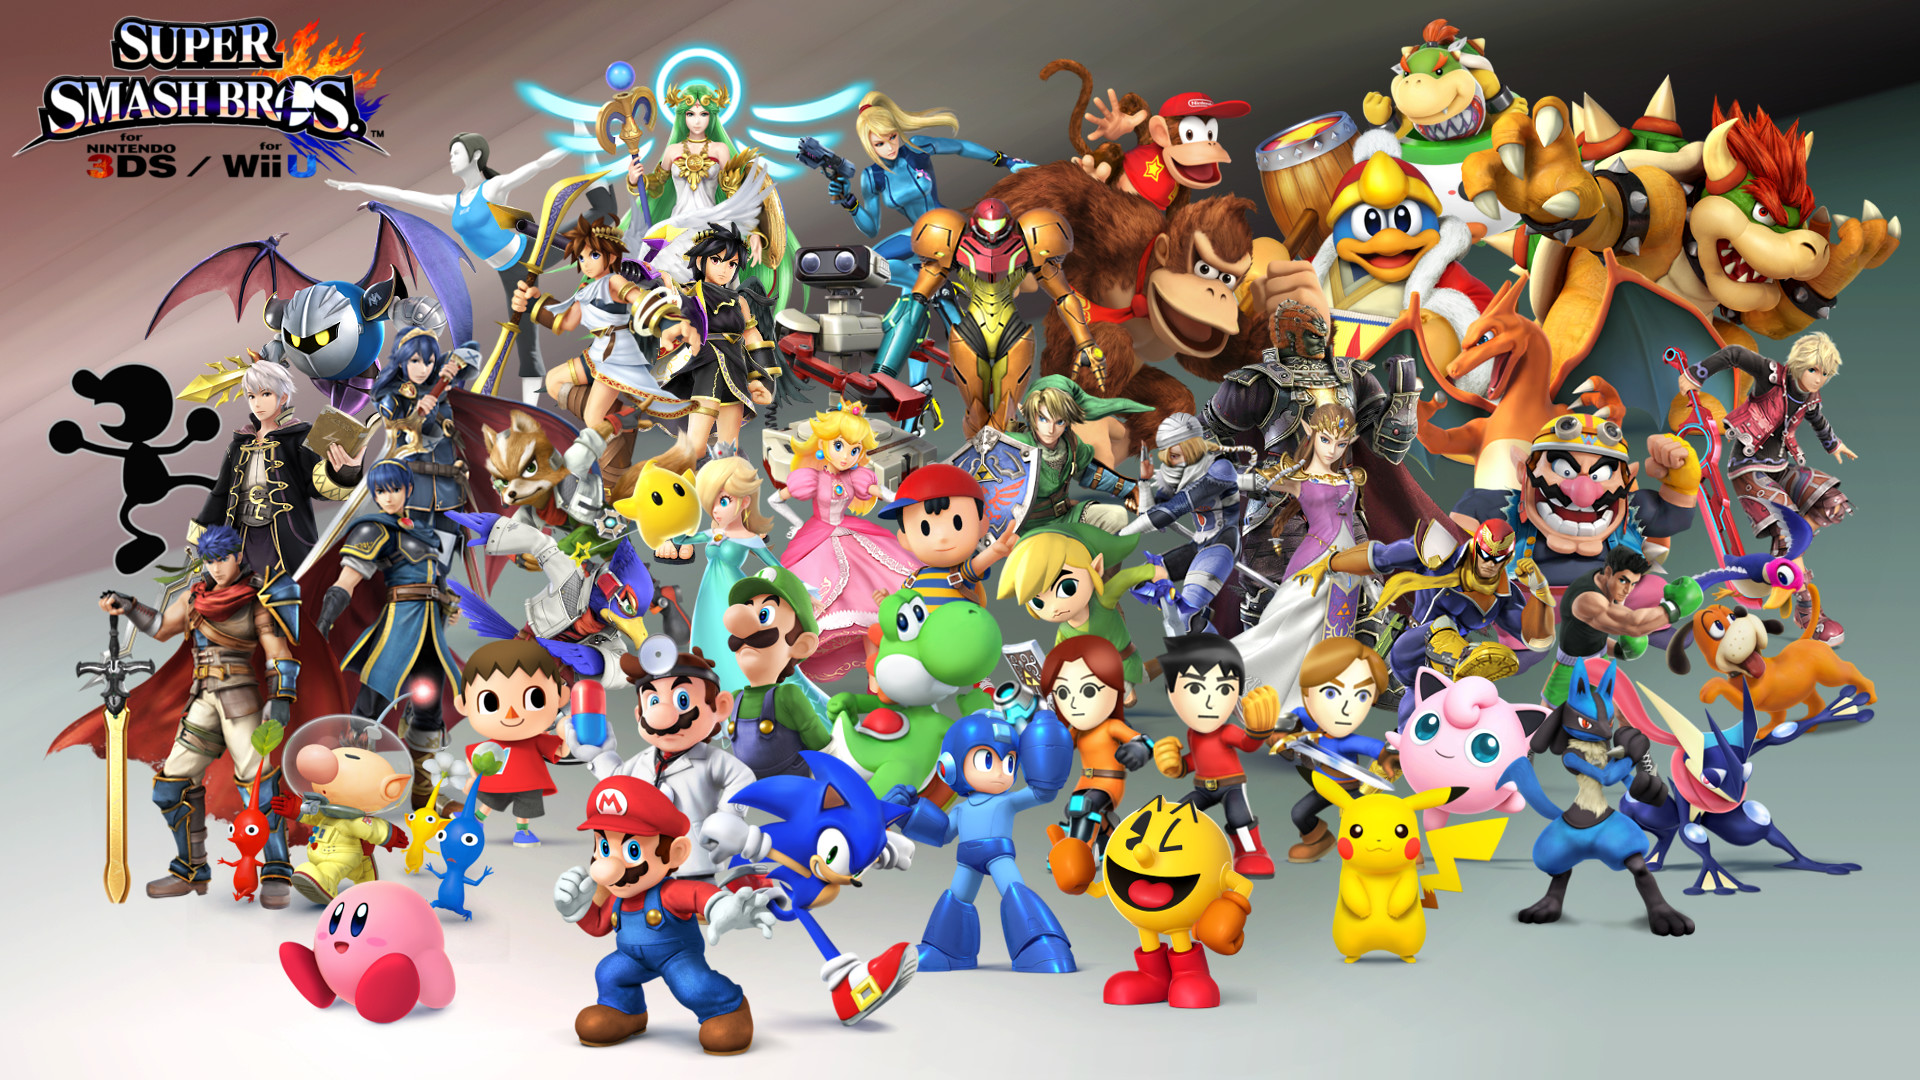 Super Smash Bros 4 Character Wallpaper – Update 9/18